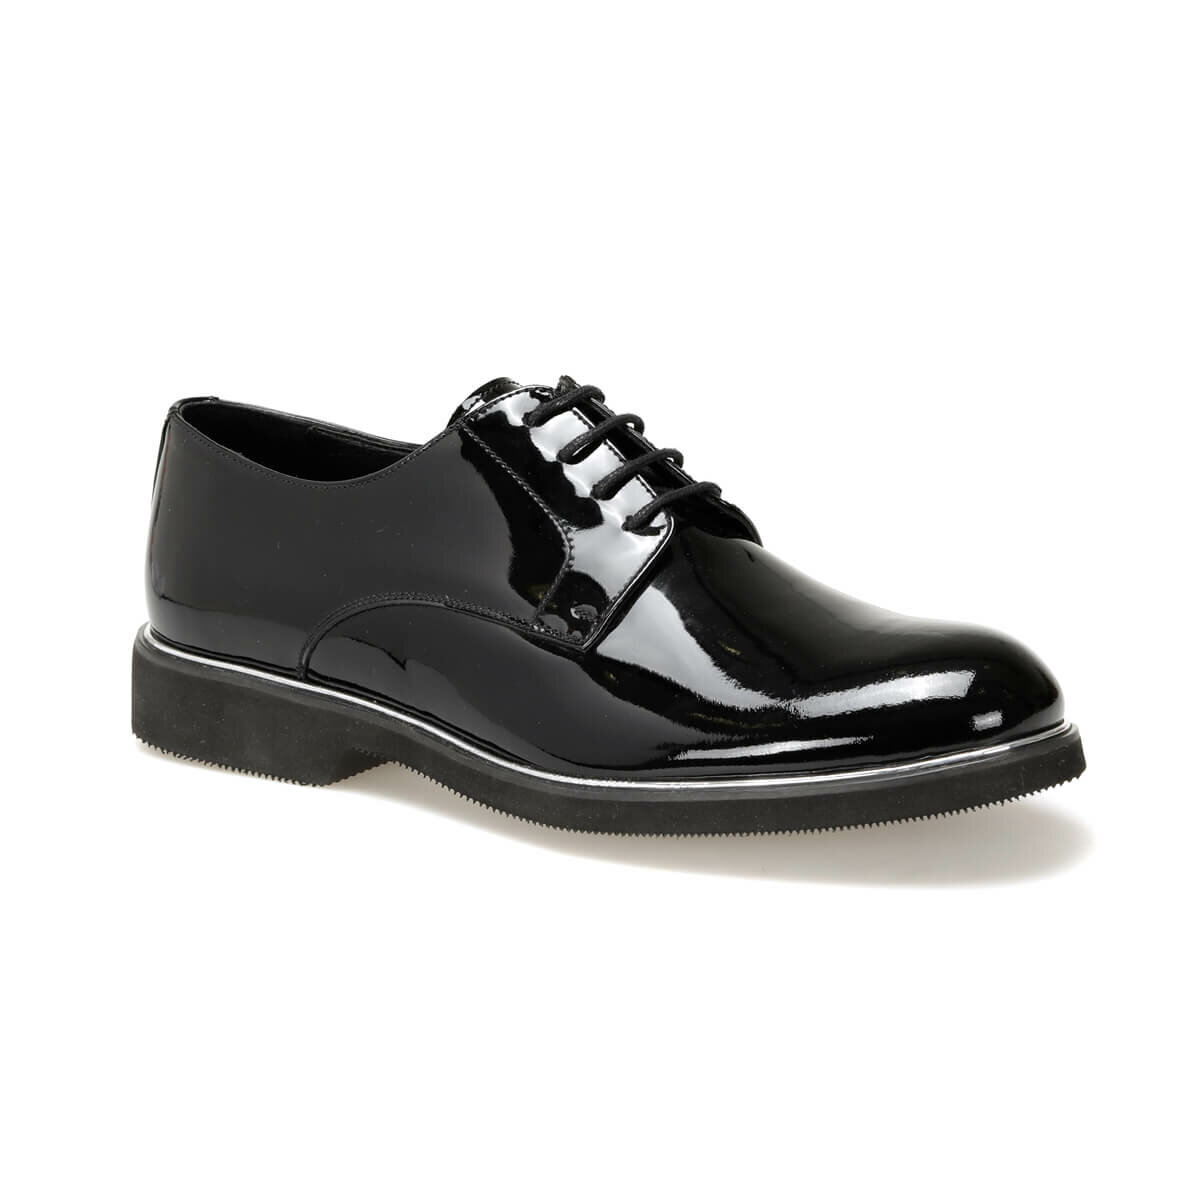 FLO エルグ-965 黒人男性の古典的な靴 JJ-Stiller